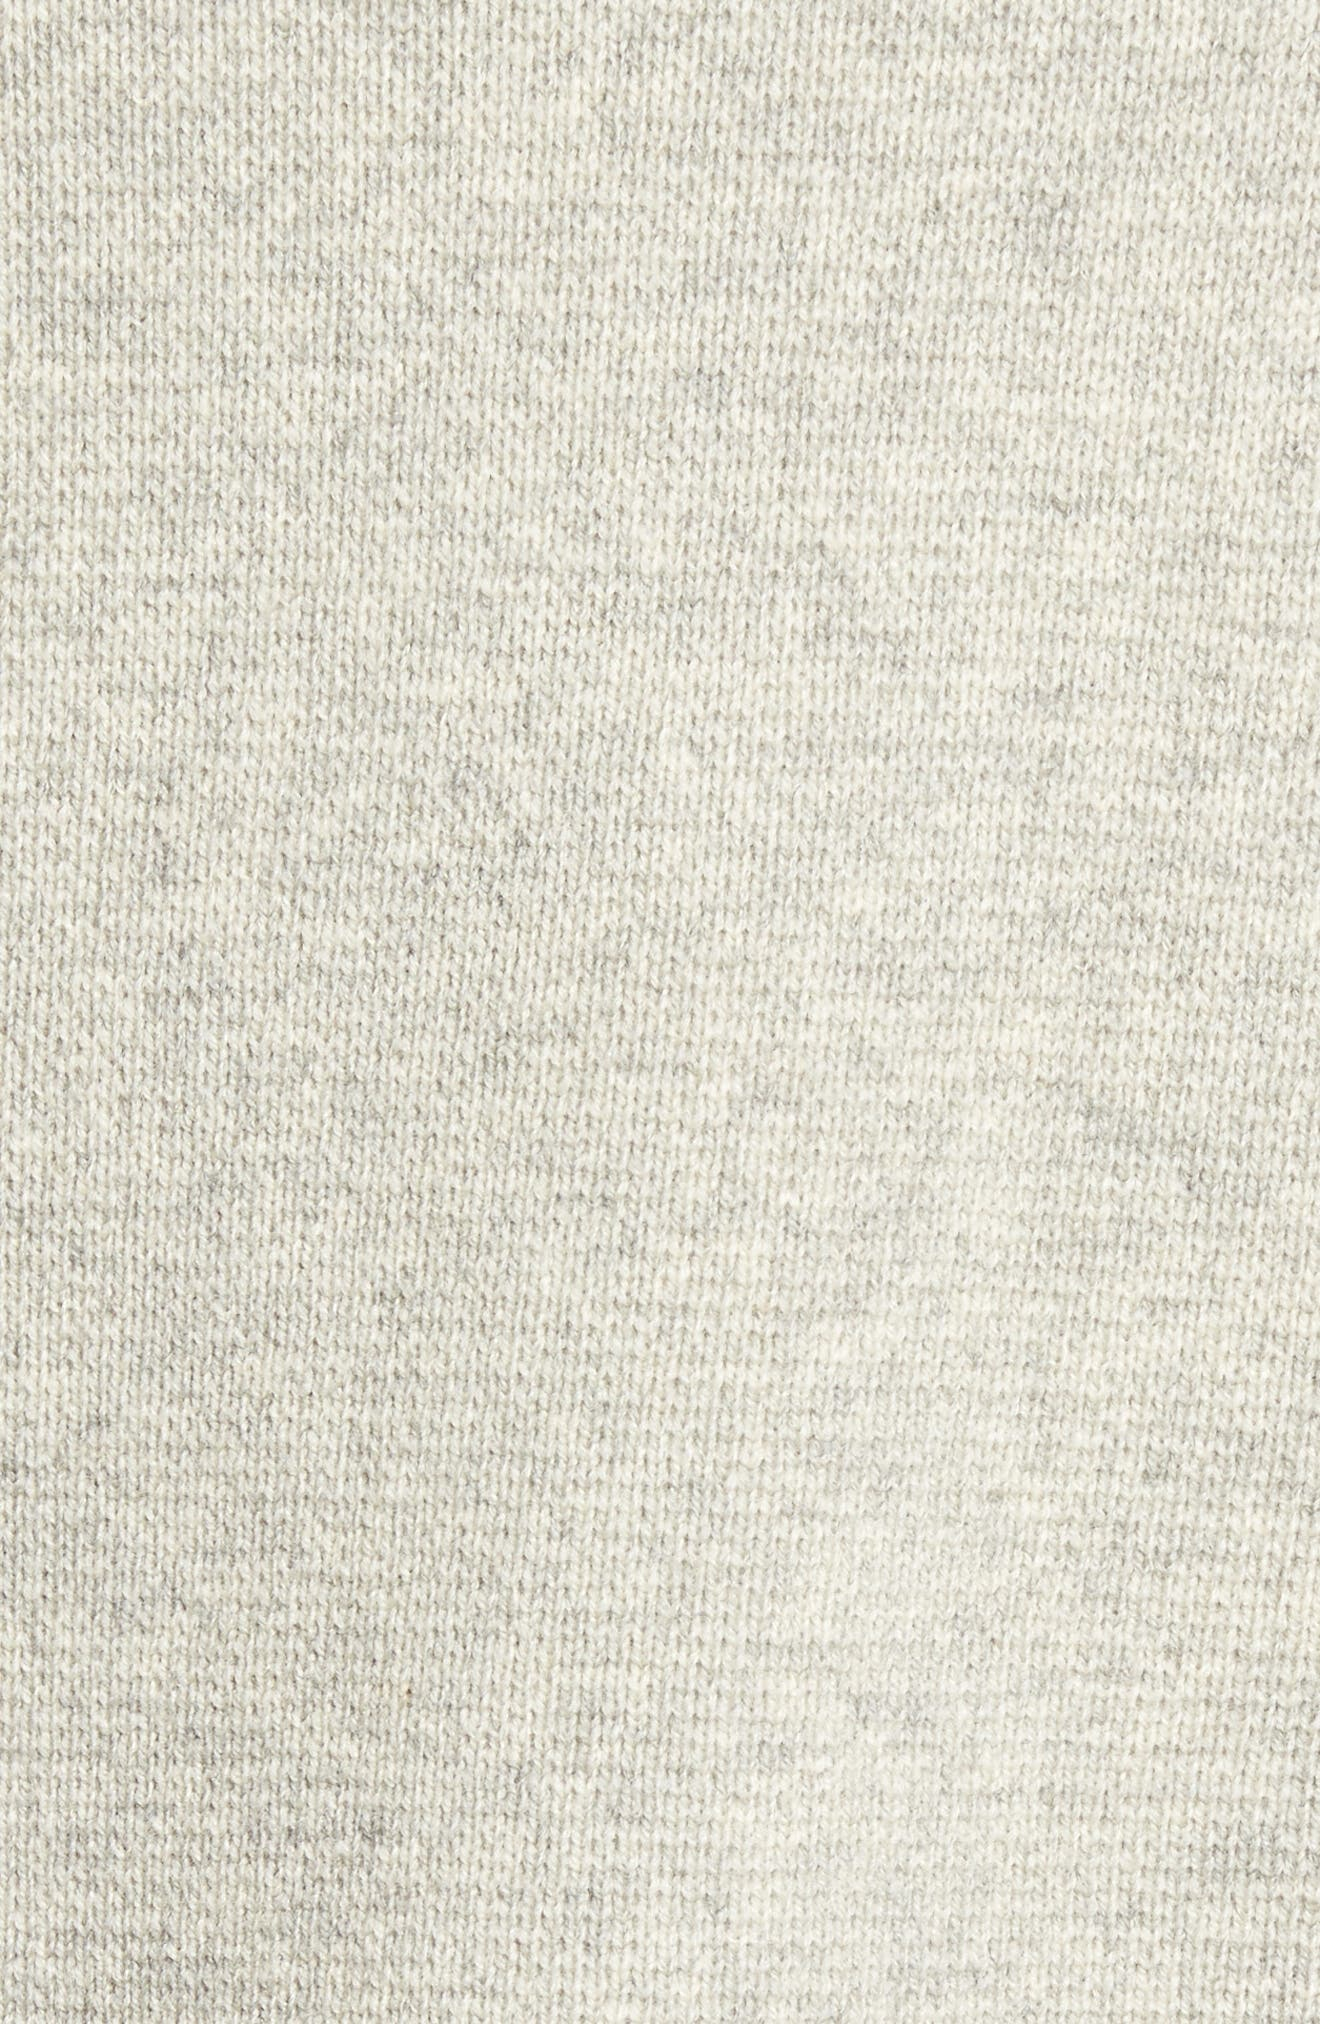 Blazer Sweater Jacket,                             Alternate thumbnail 5, color,                             020